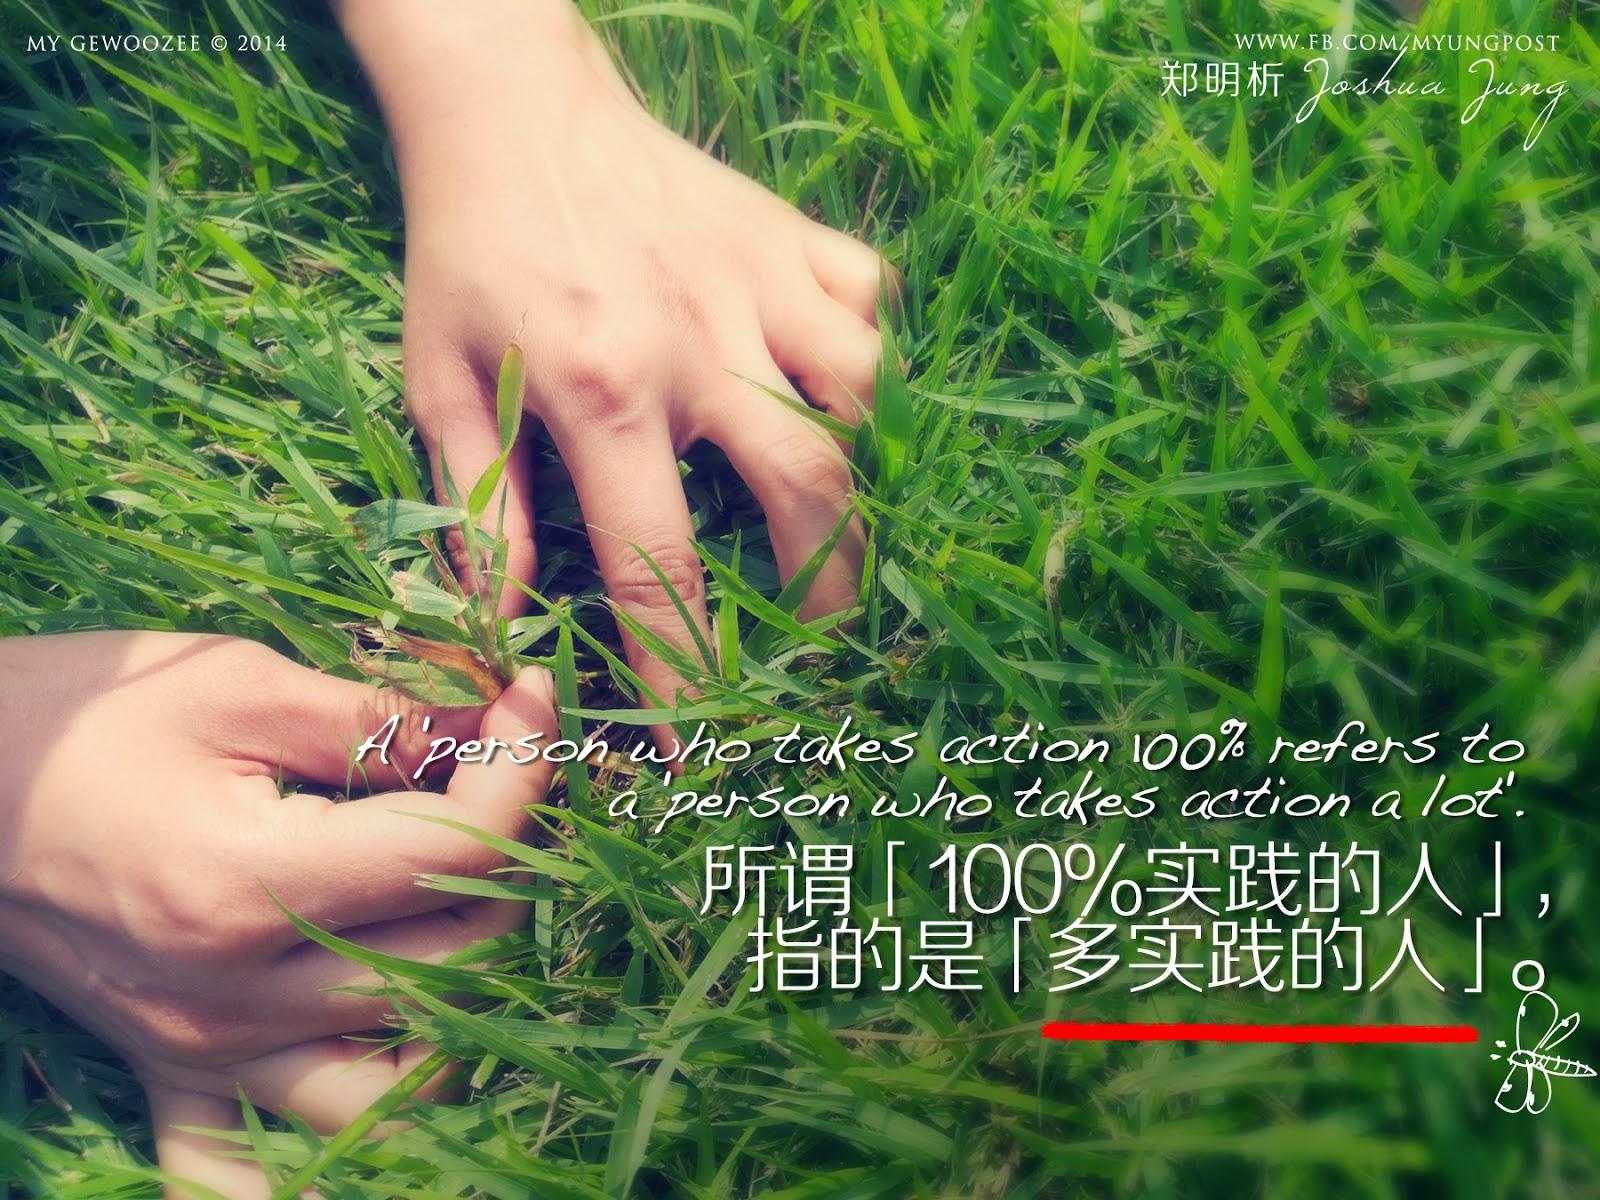 郑明析,摄理,月明洞,拔草,草地,工作,绿色,Joshua Jung, Providence, Wolmyeong Dong, field, working, green